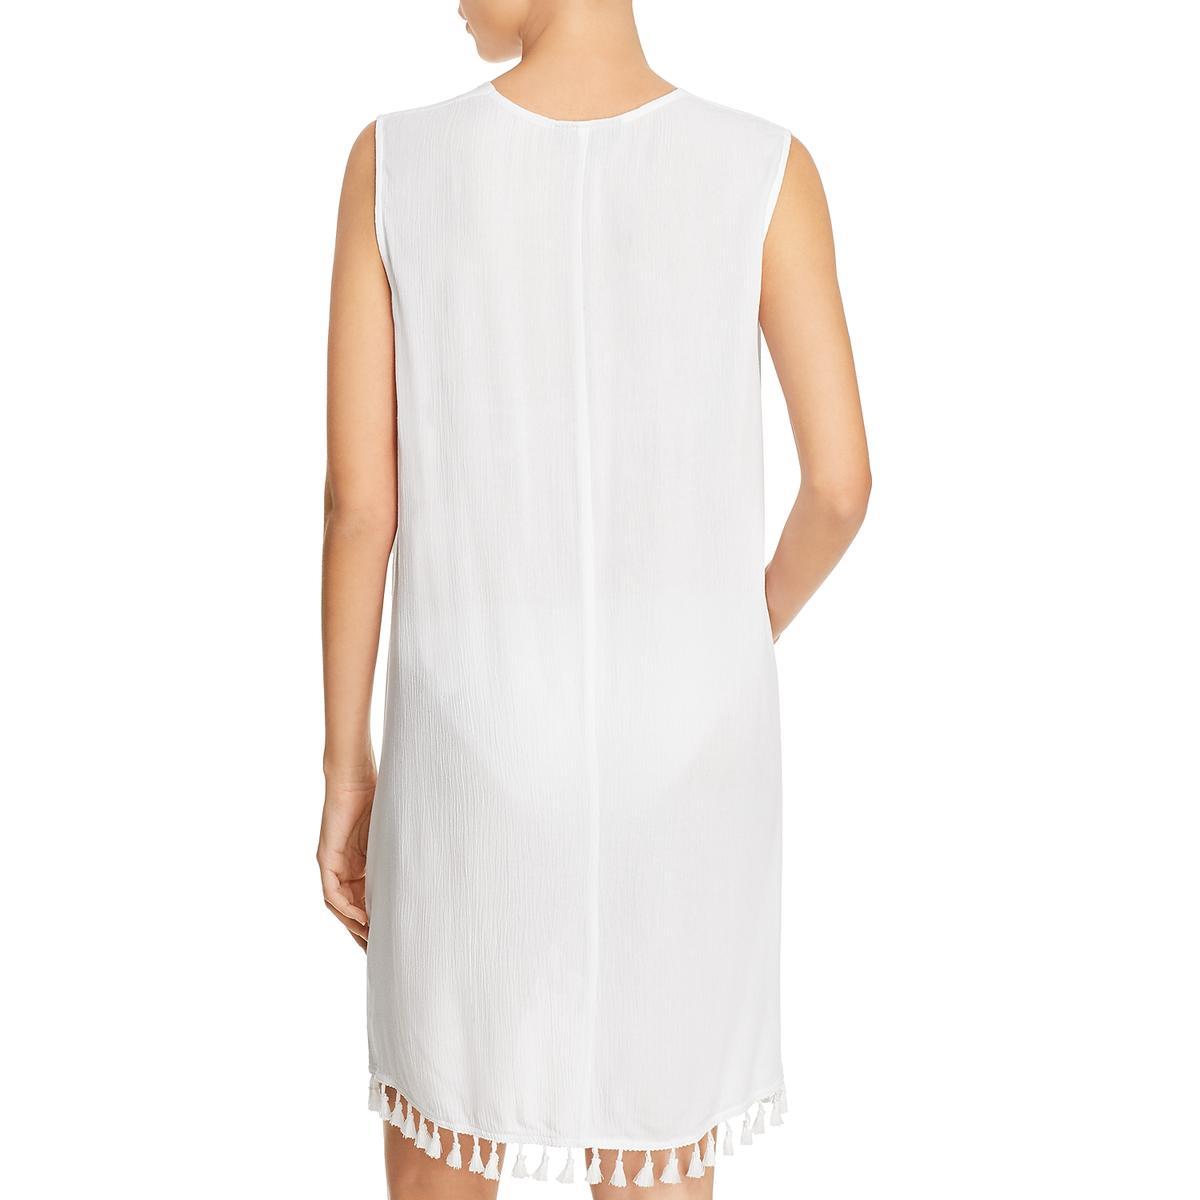 Athena Womens White Sheer Tassle Sleeveless Wrap Swim Cover-Up S BHFO 1884